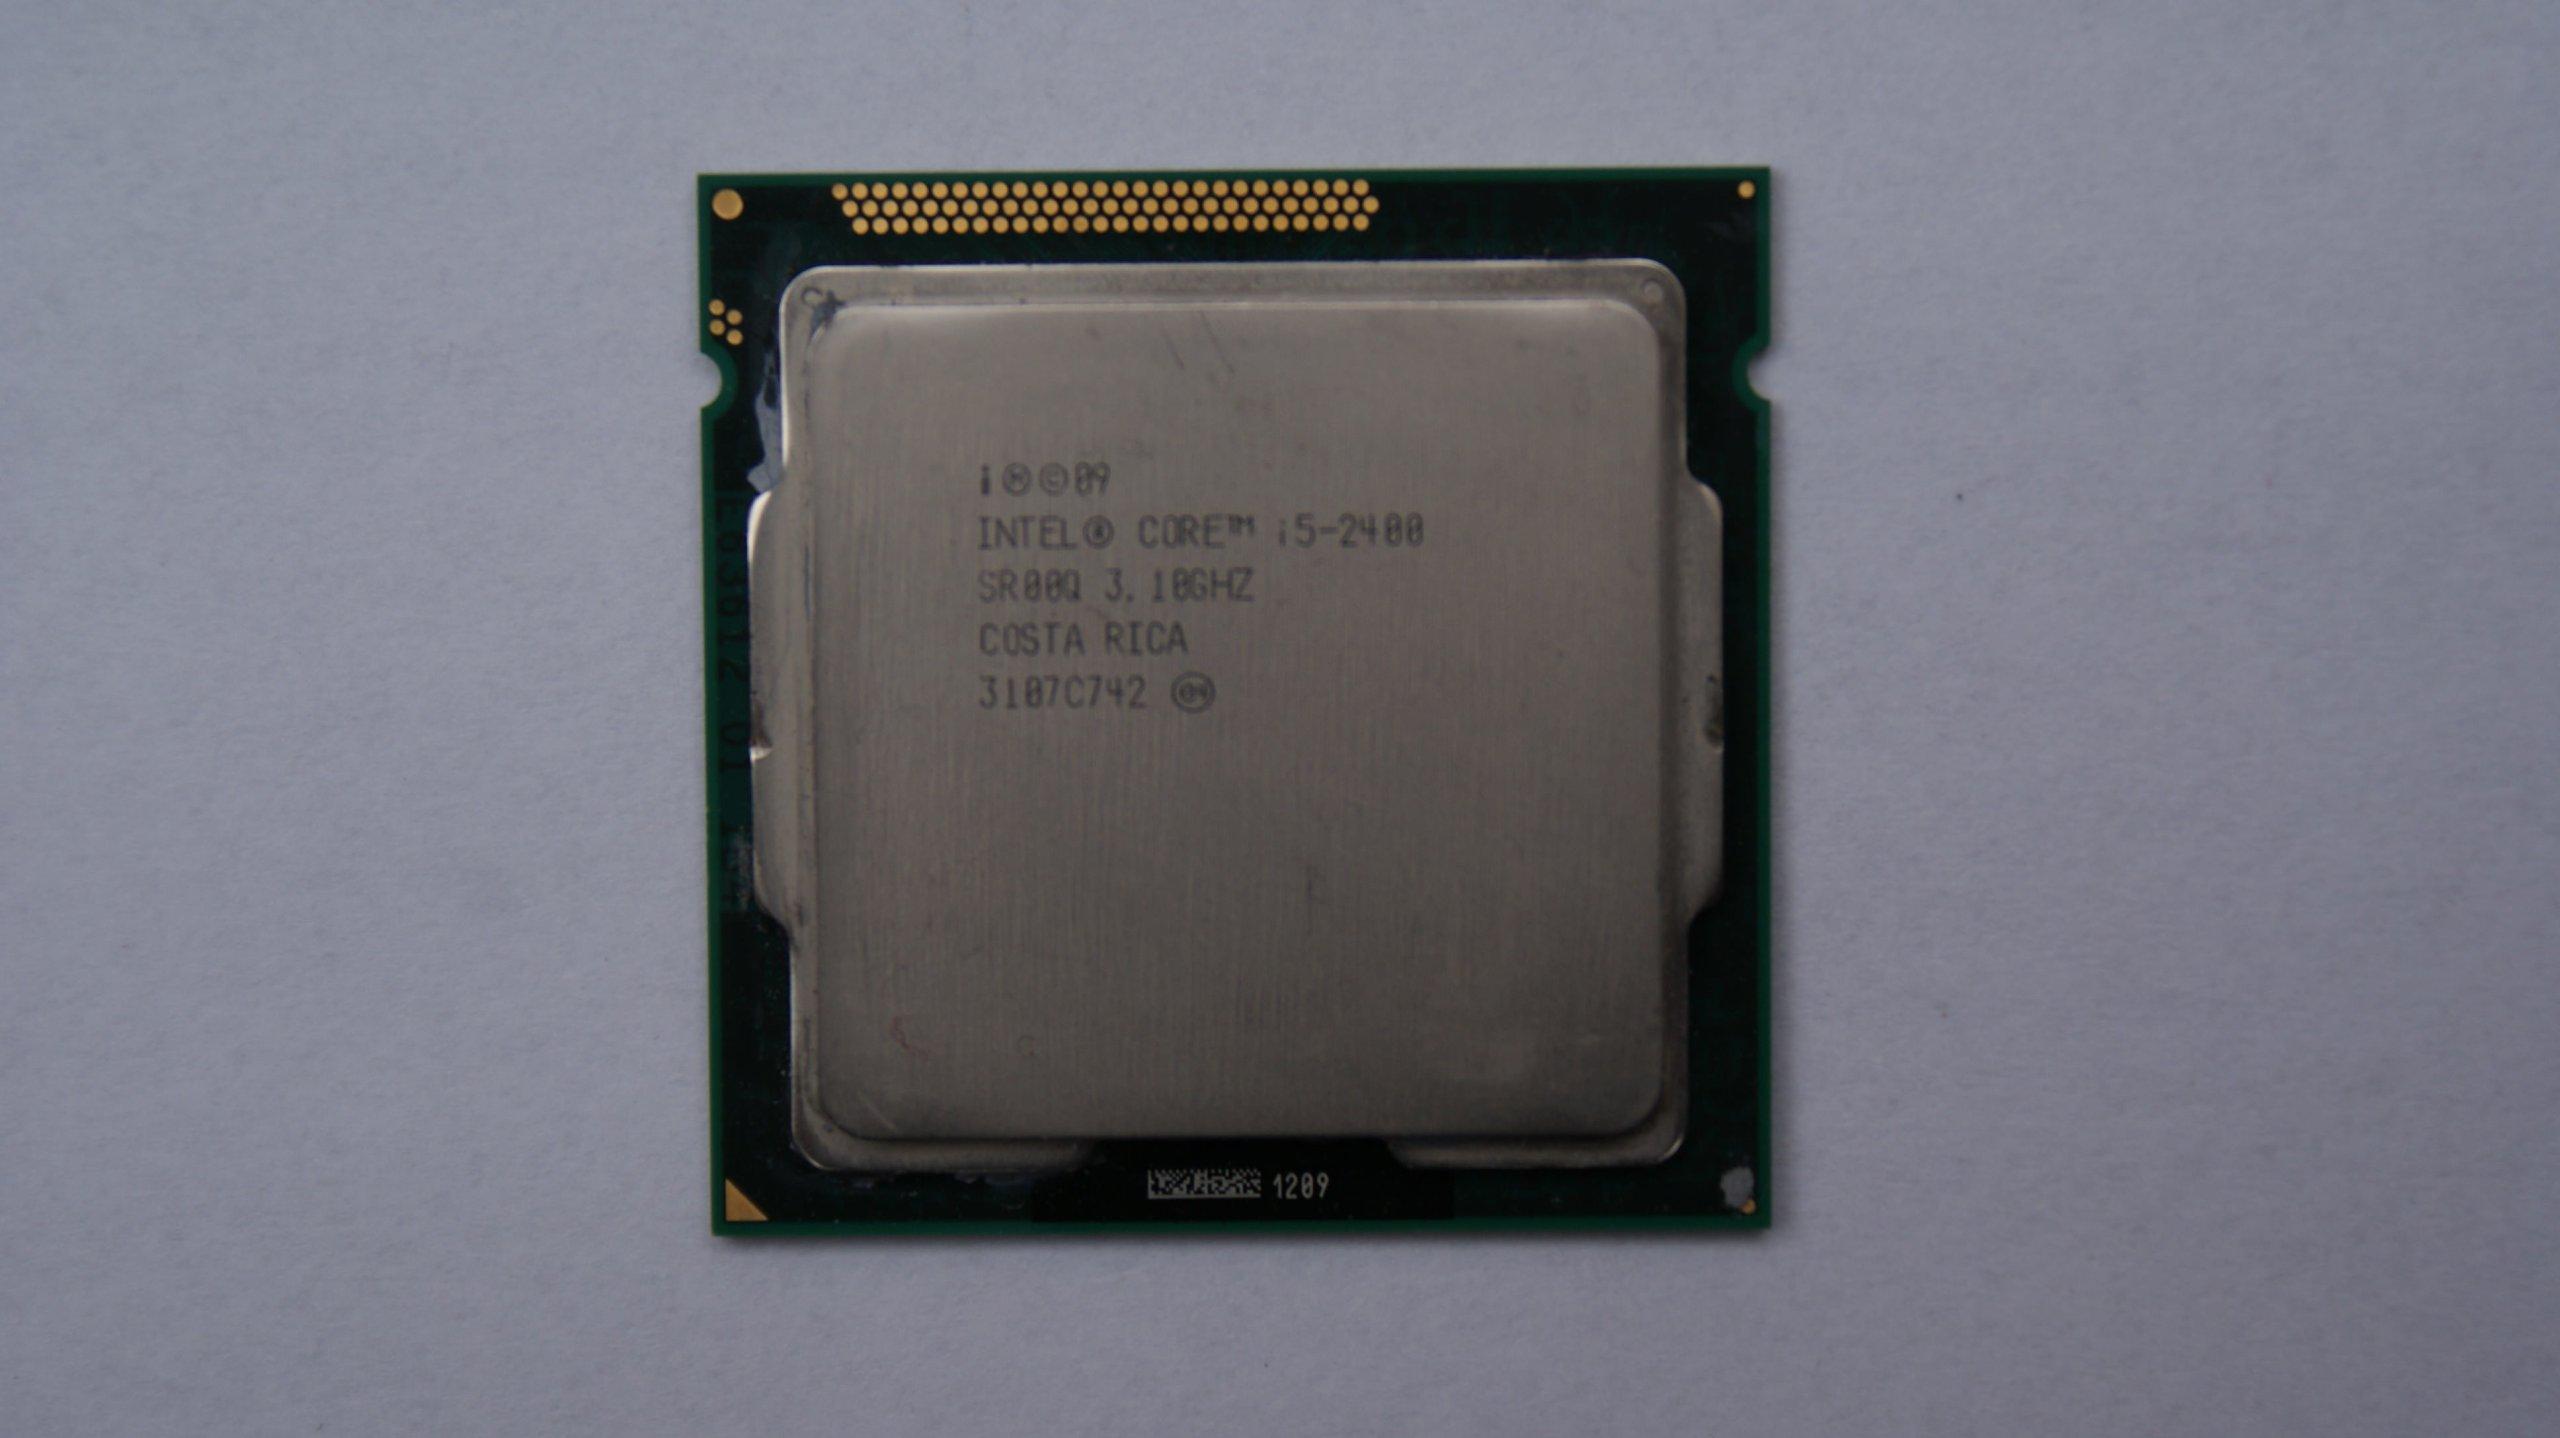 INTEL Core i5-2400 3.1 GHz + pasta gw12m-cy KRK